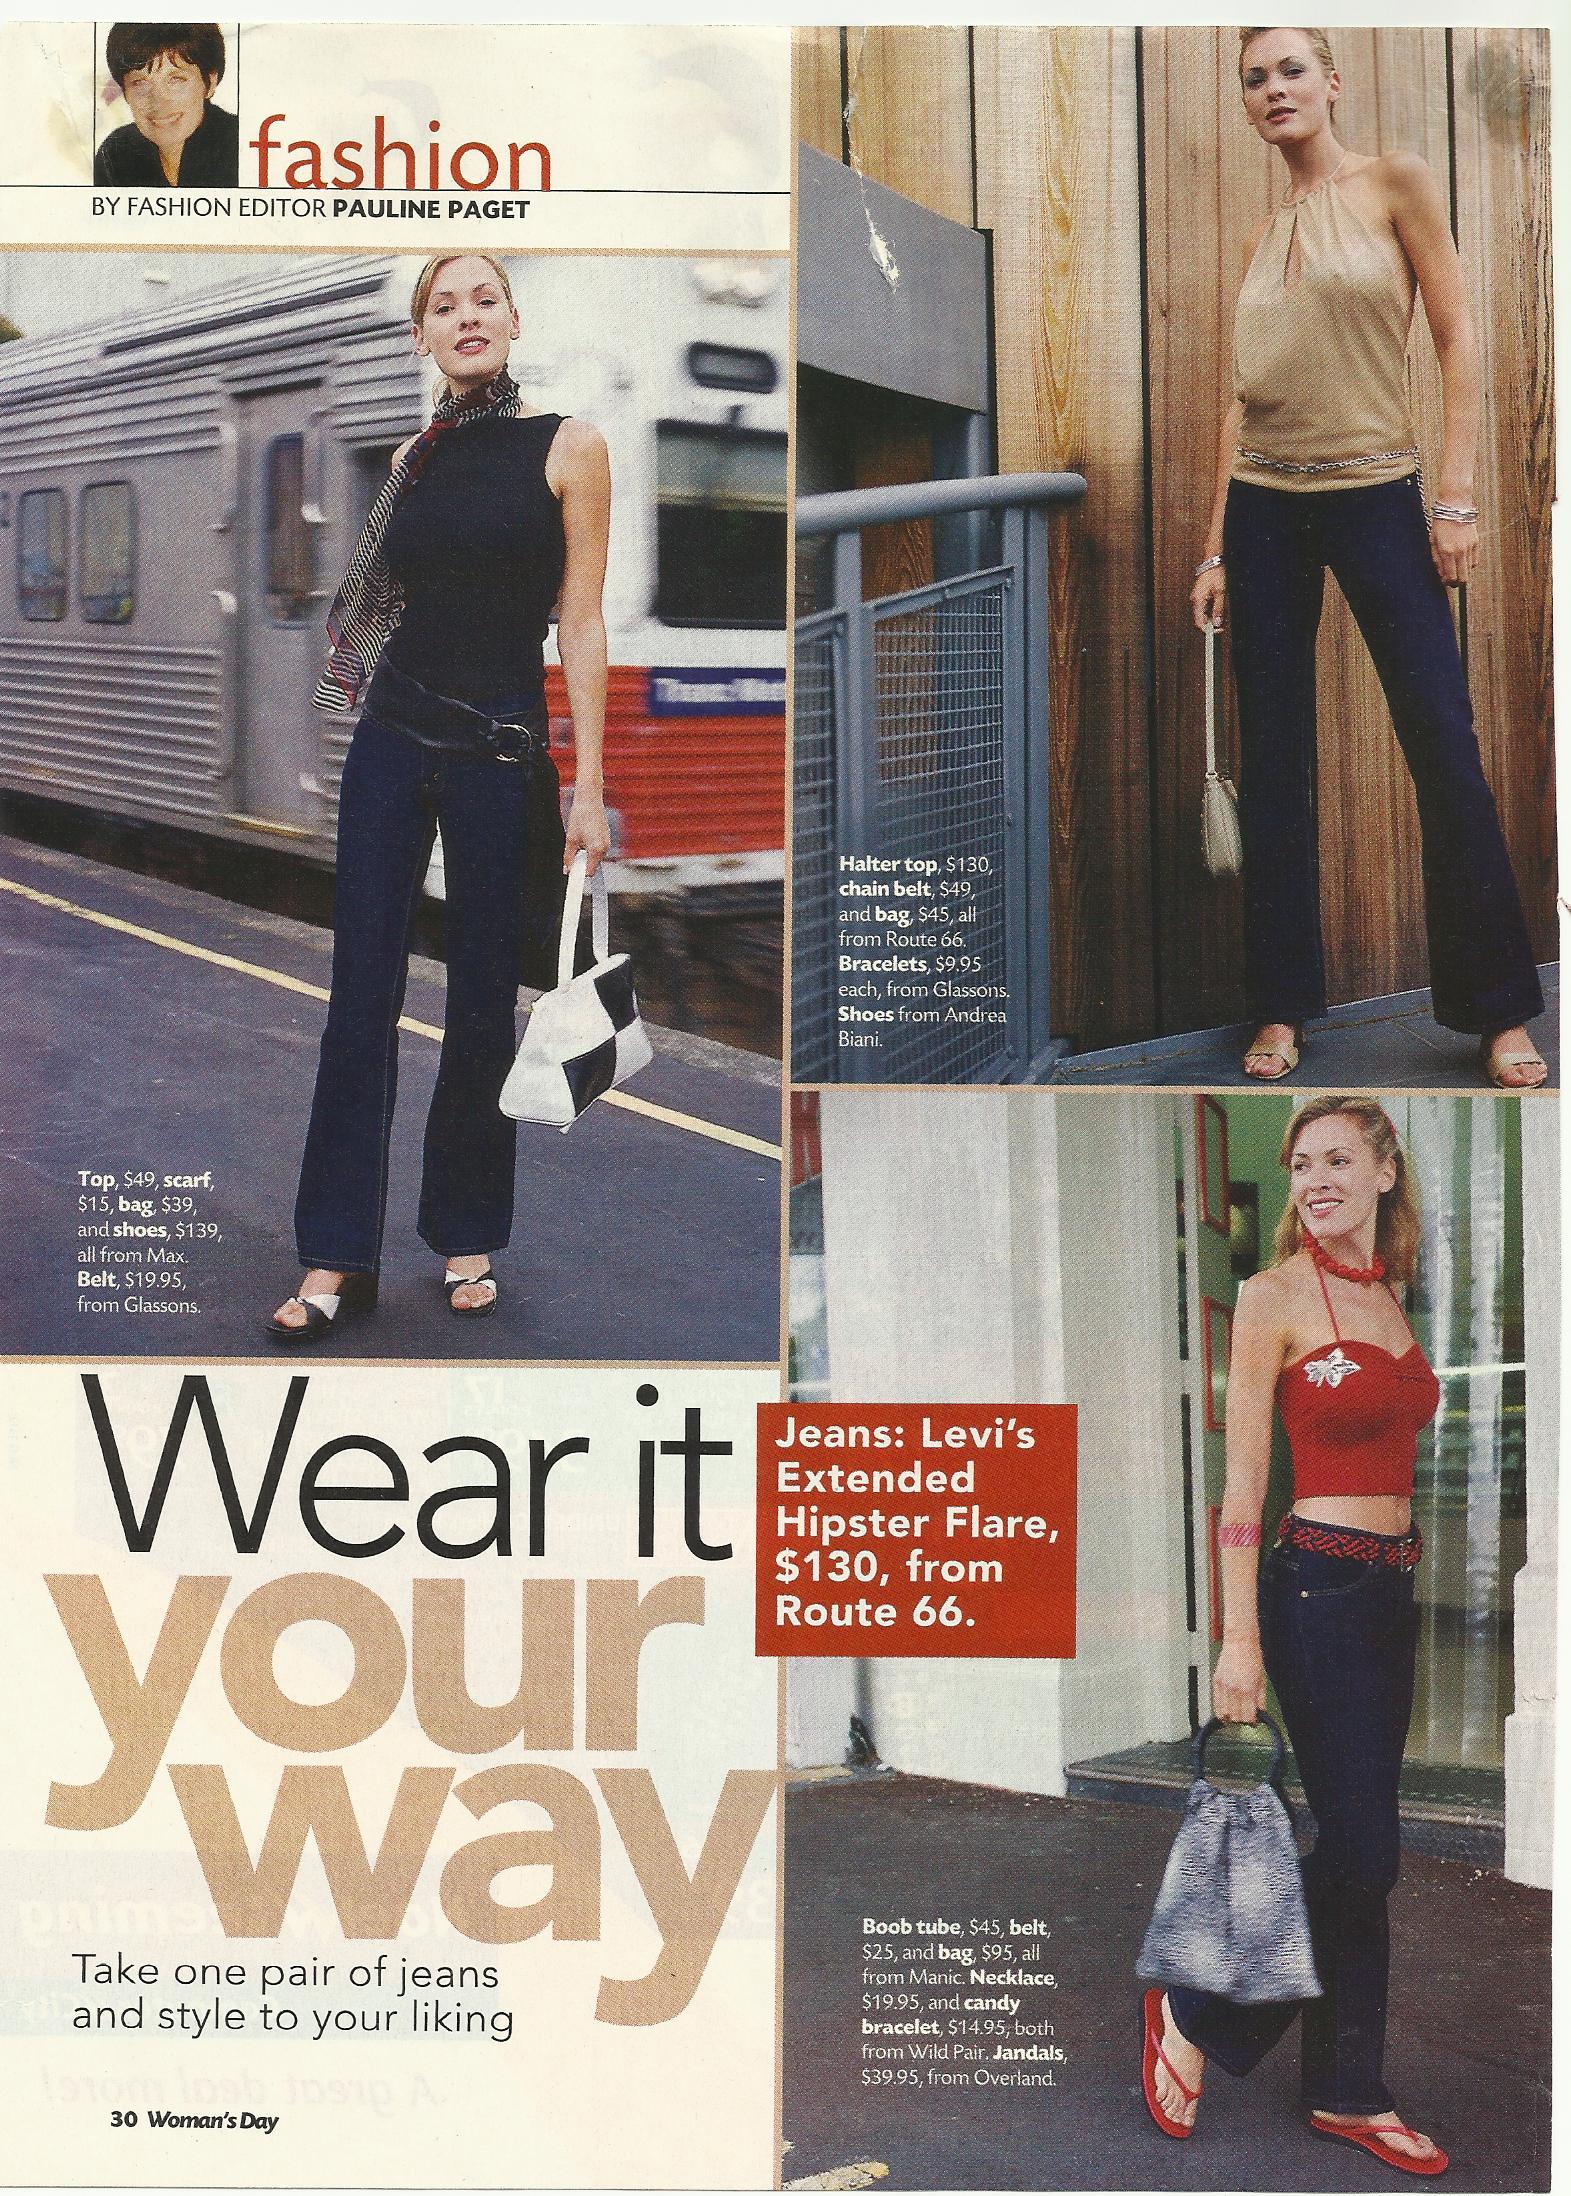 Women's Day fashion spread